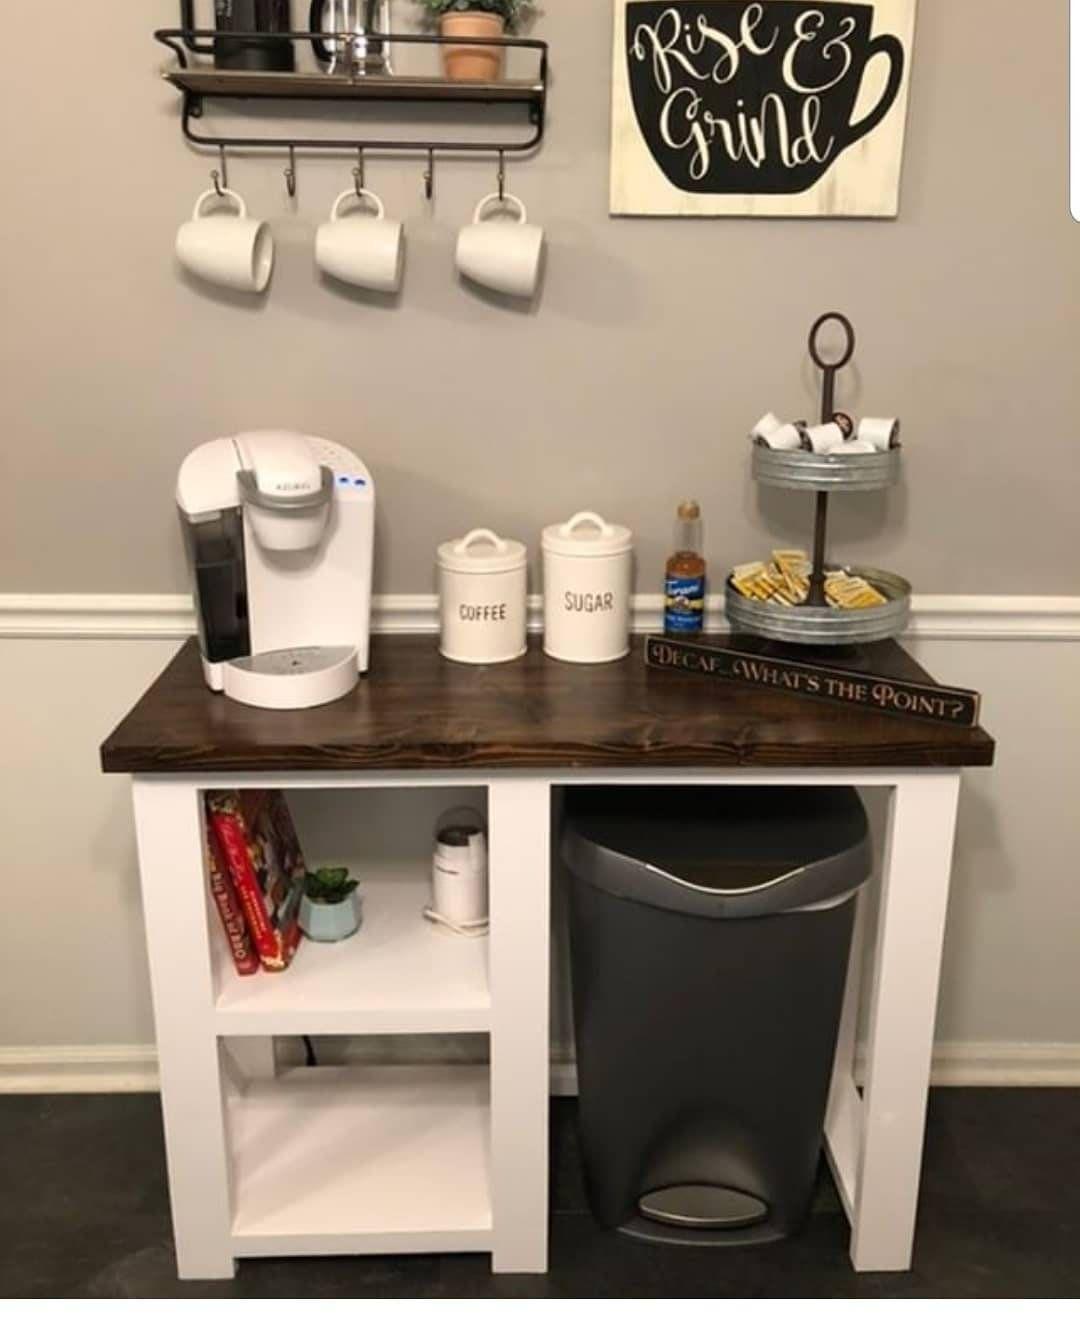 Rustic X Coffee Bar / Rustic X Farmhouse Coffee Bar / Mini Fridge Table / Dining Bar / Farmhouse Bar / Fridge Table / Mini Fridge Console